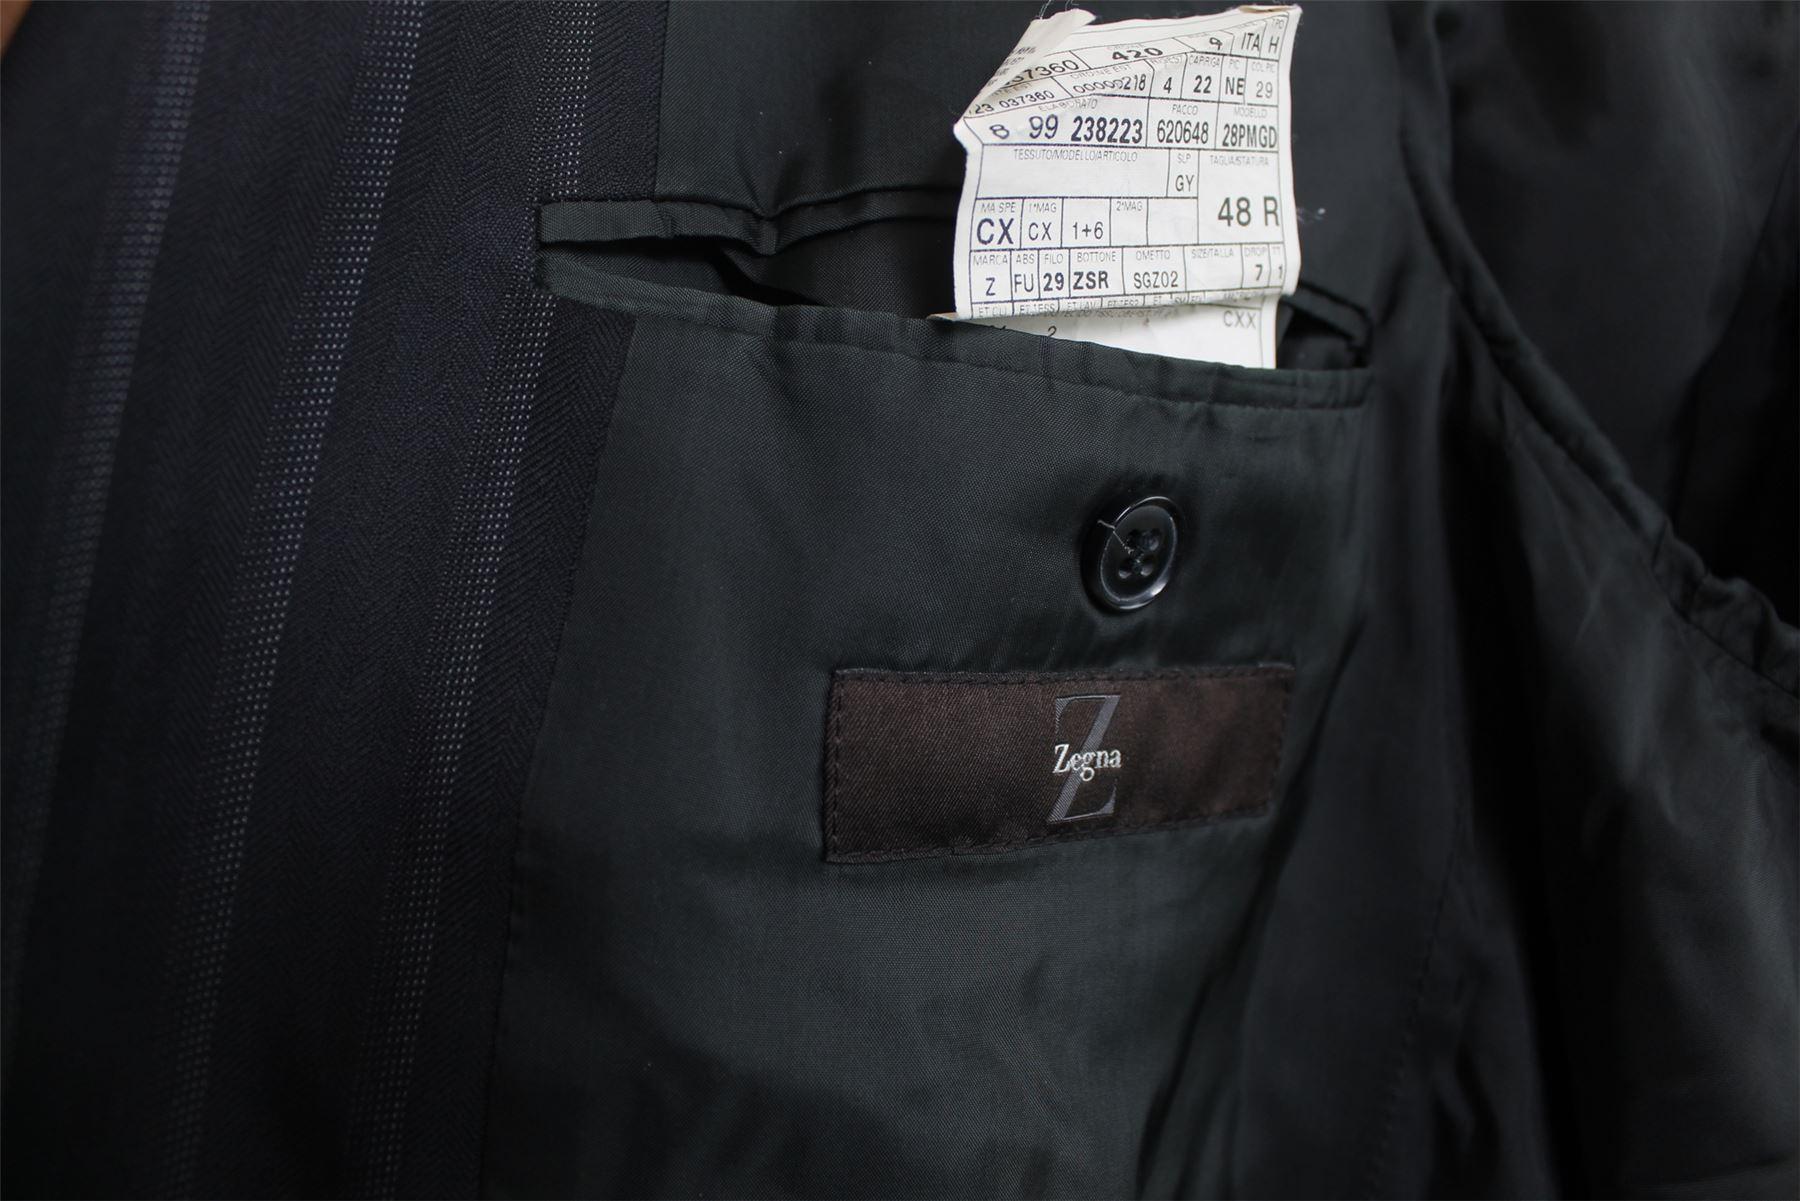 ERMENEGILDO ZEGNA Nero a strisce di lana Suit f2f16819d78